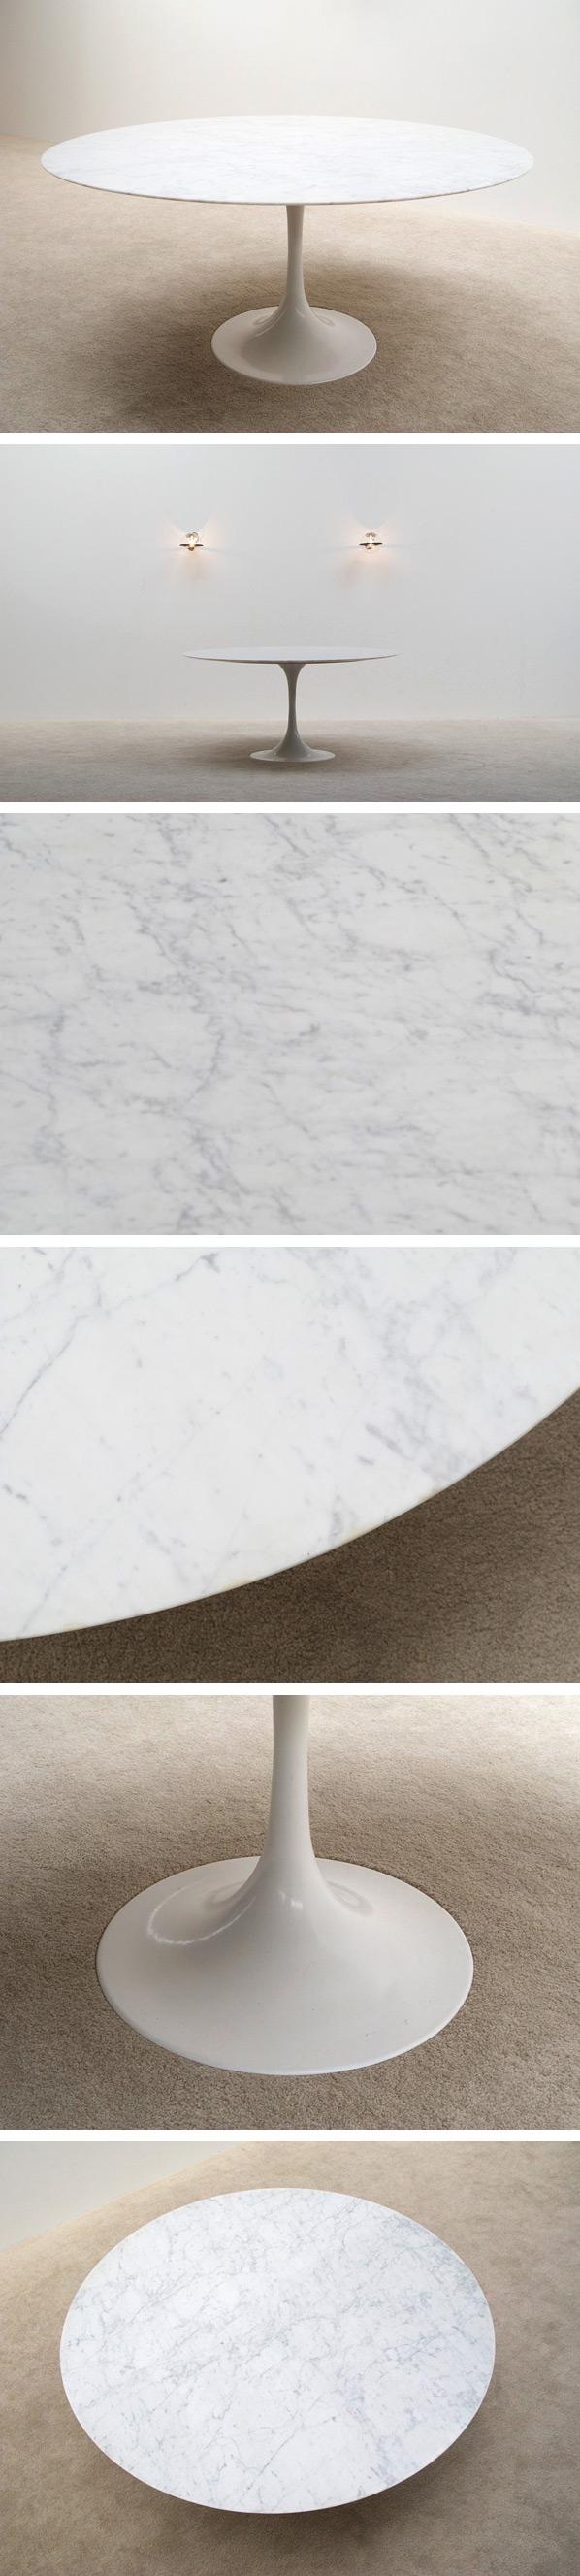 Eero Saarinen round marble dinning table Knoll Large